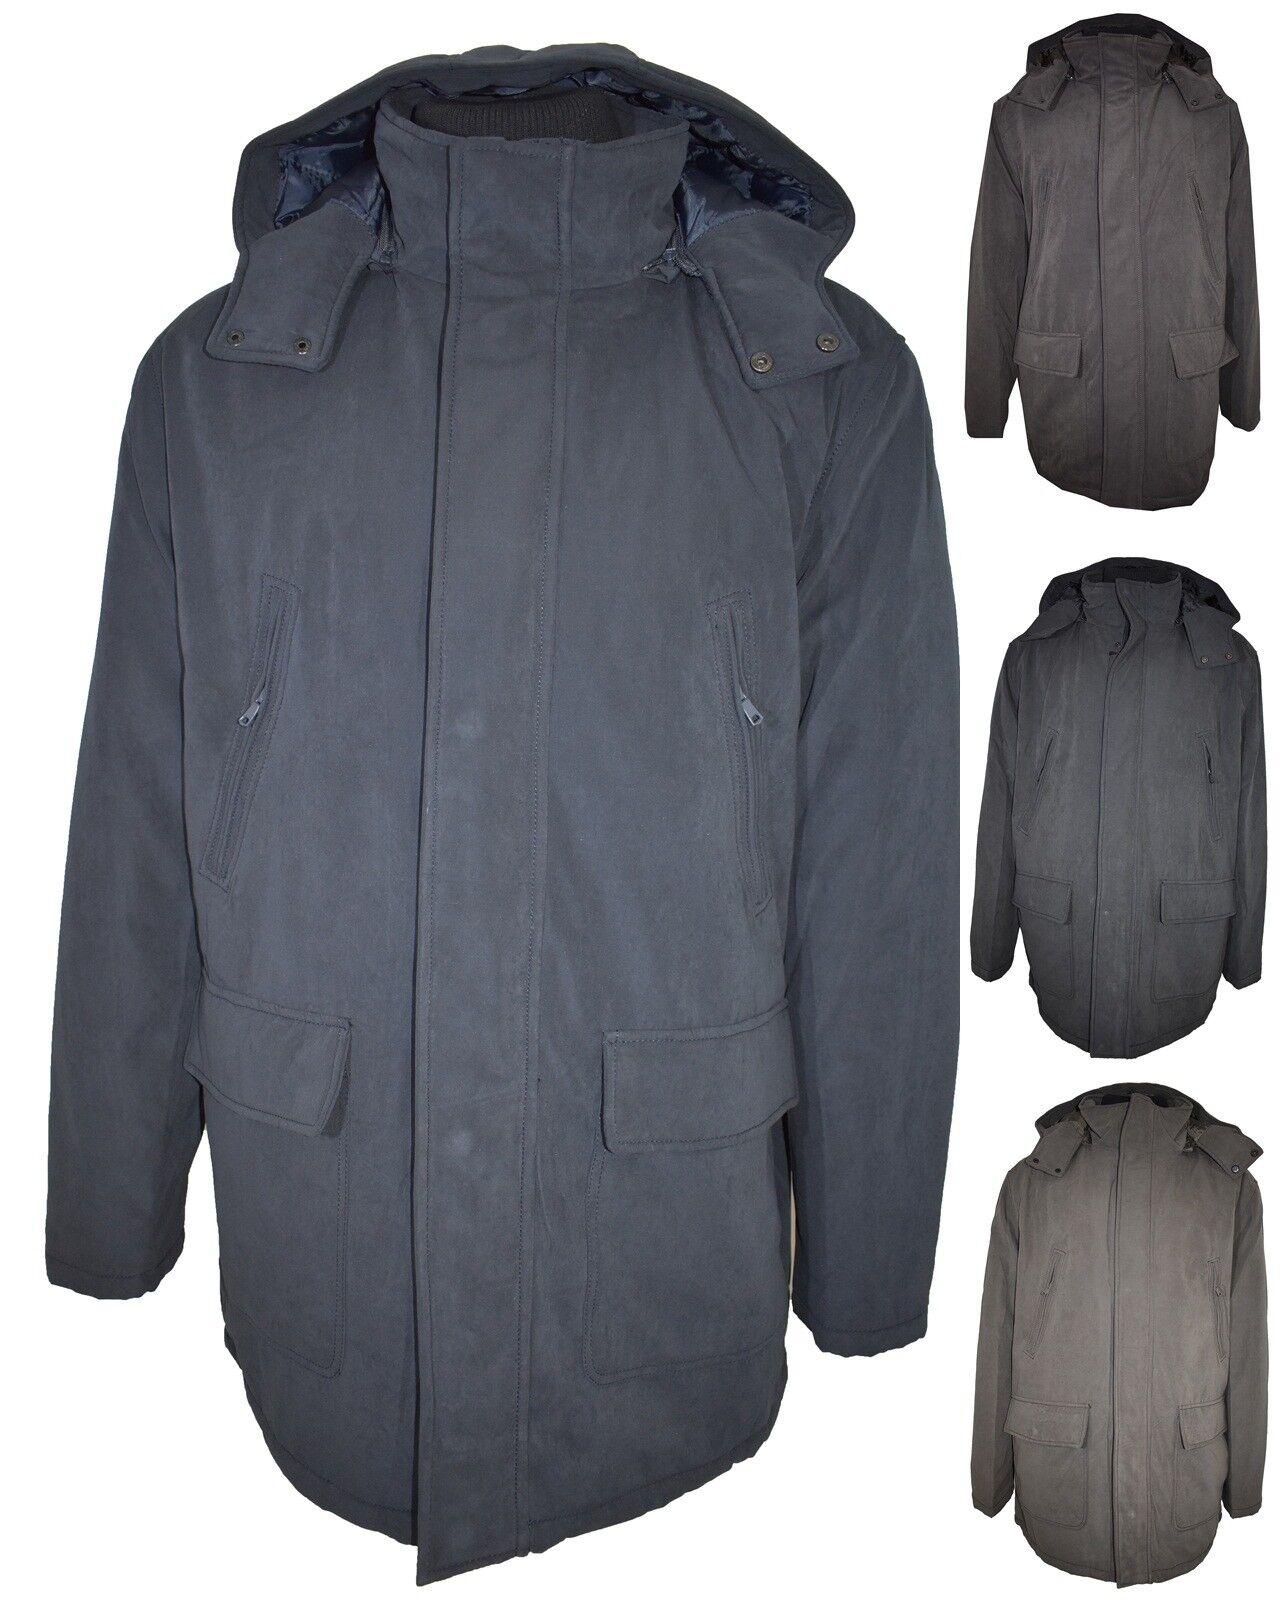 Giubbotto giaccone invernale da uomo giubbino taglie forti 3xl 4xl 5xl 6xl 7xl a